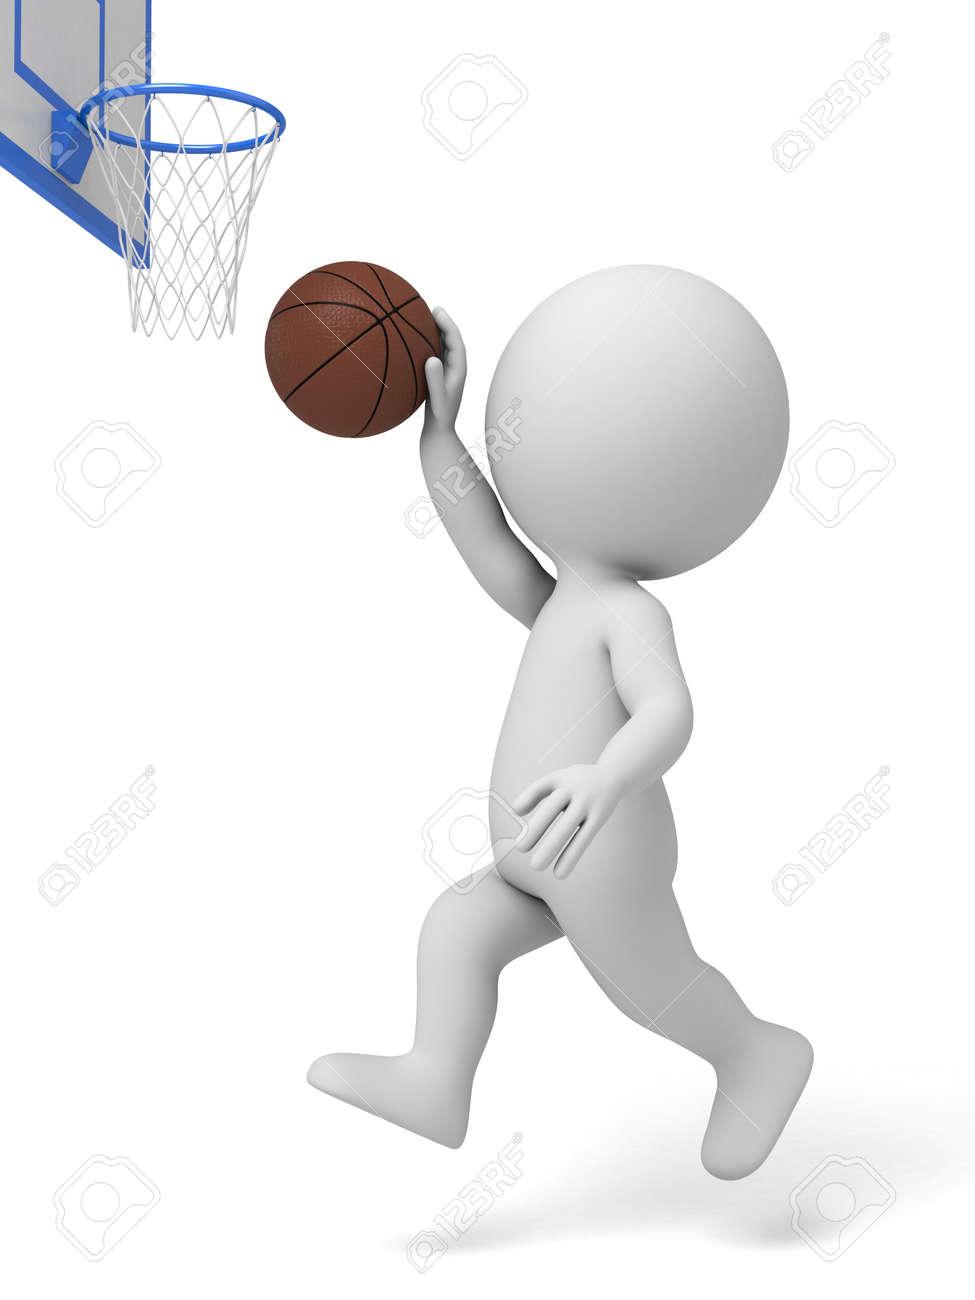 Fein Basketball Halbgericht Vorlage Ideen - Entry Level Resume ...